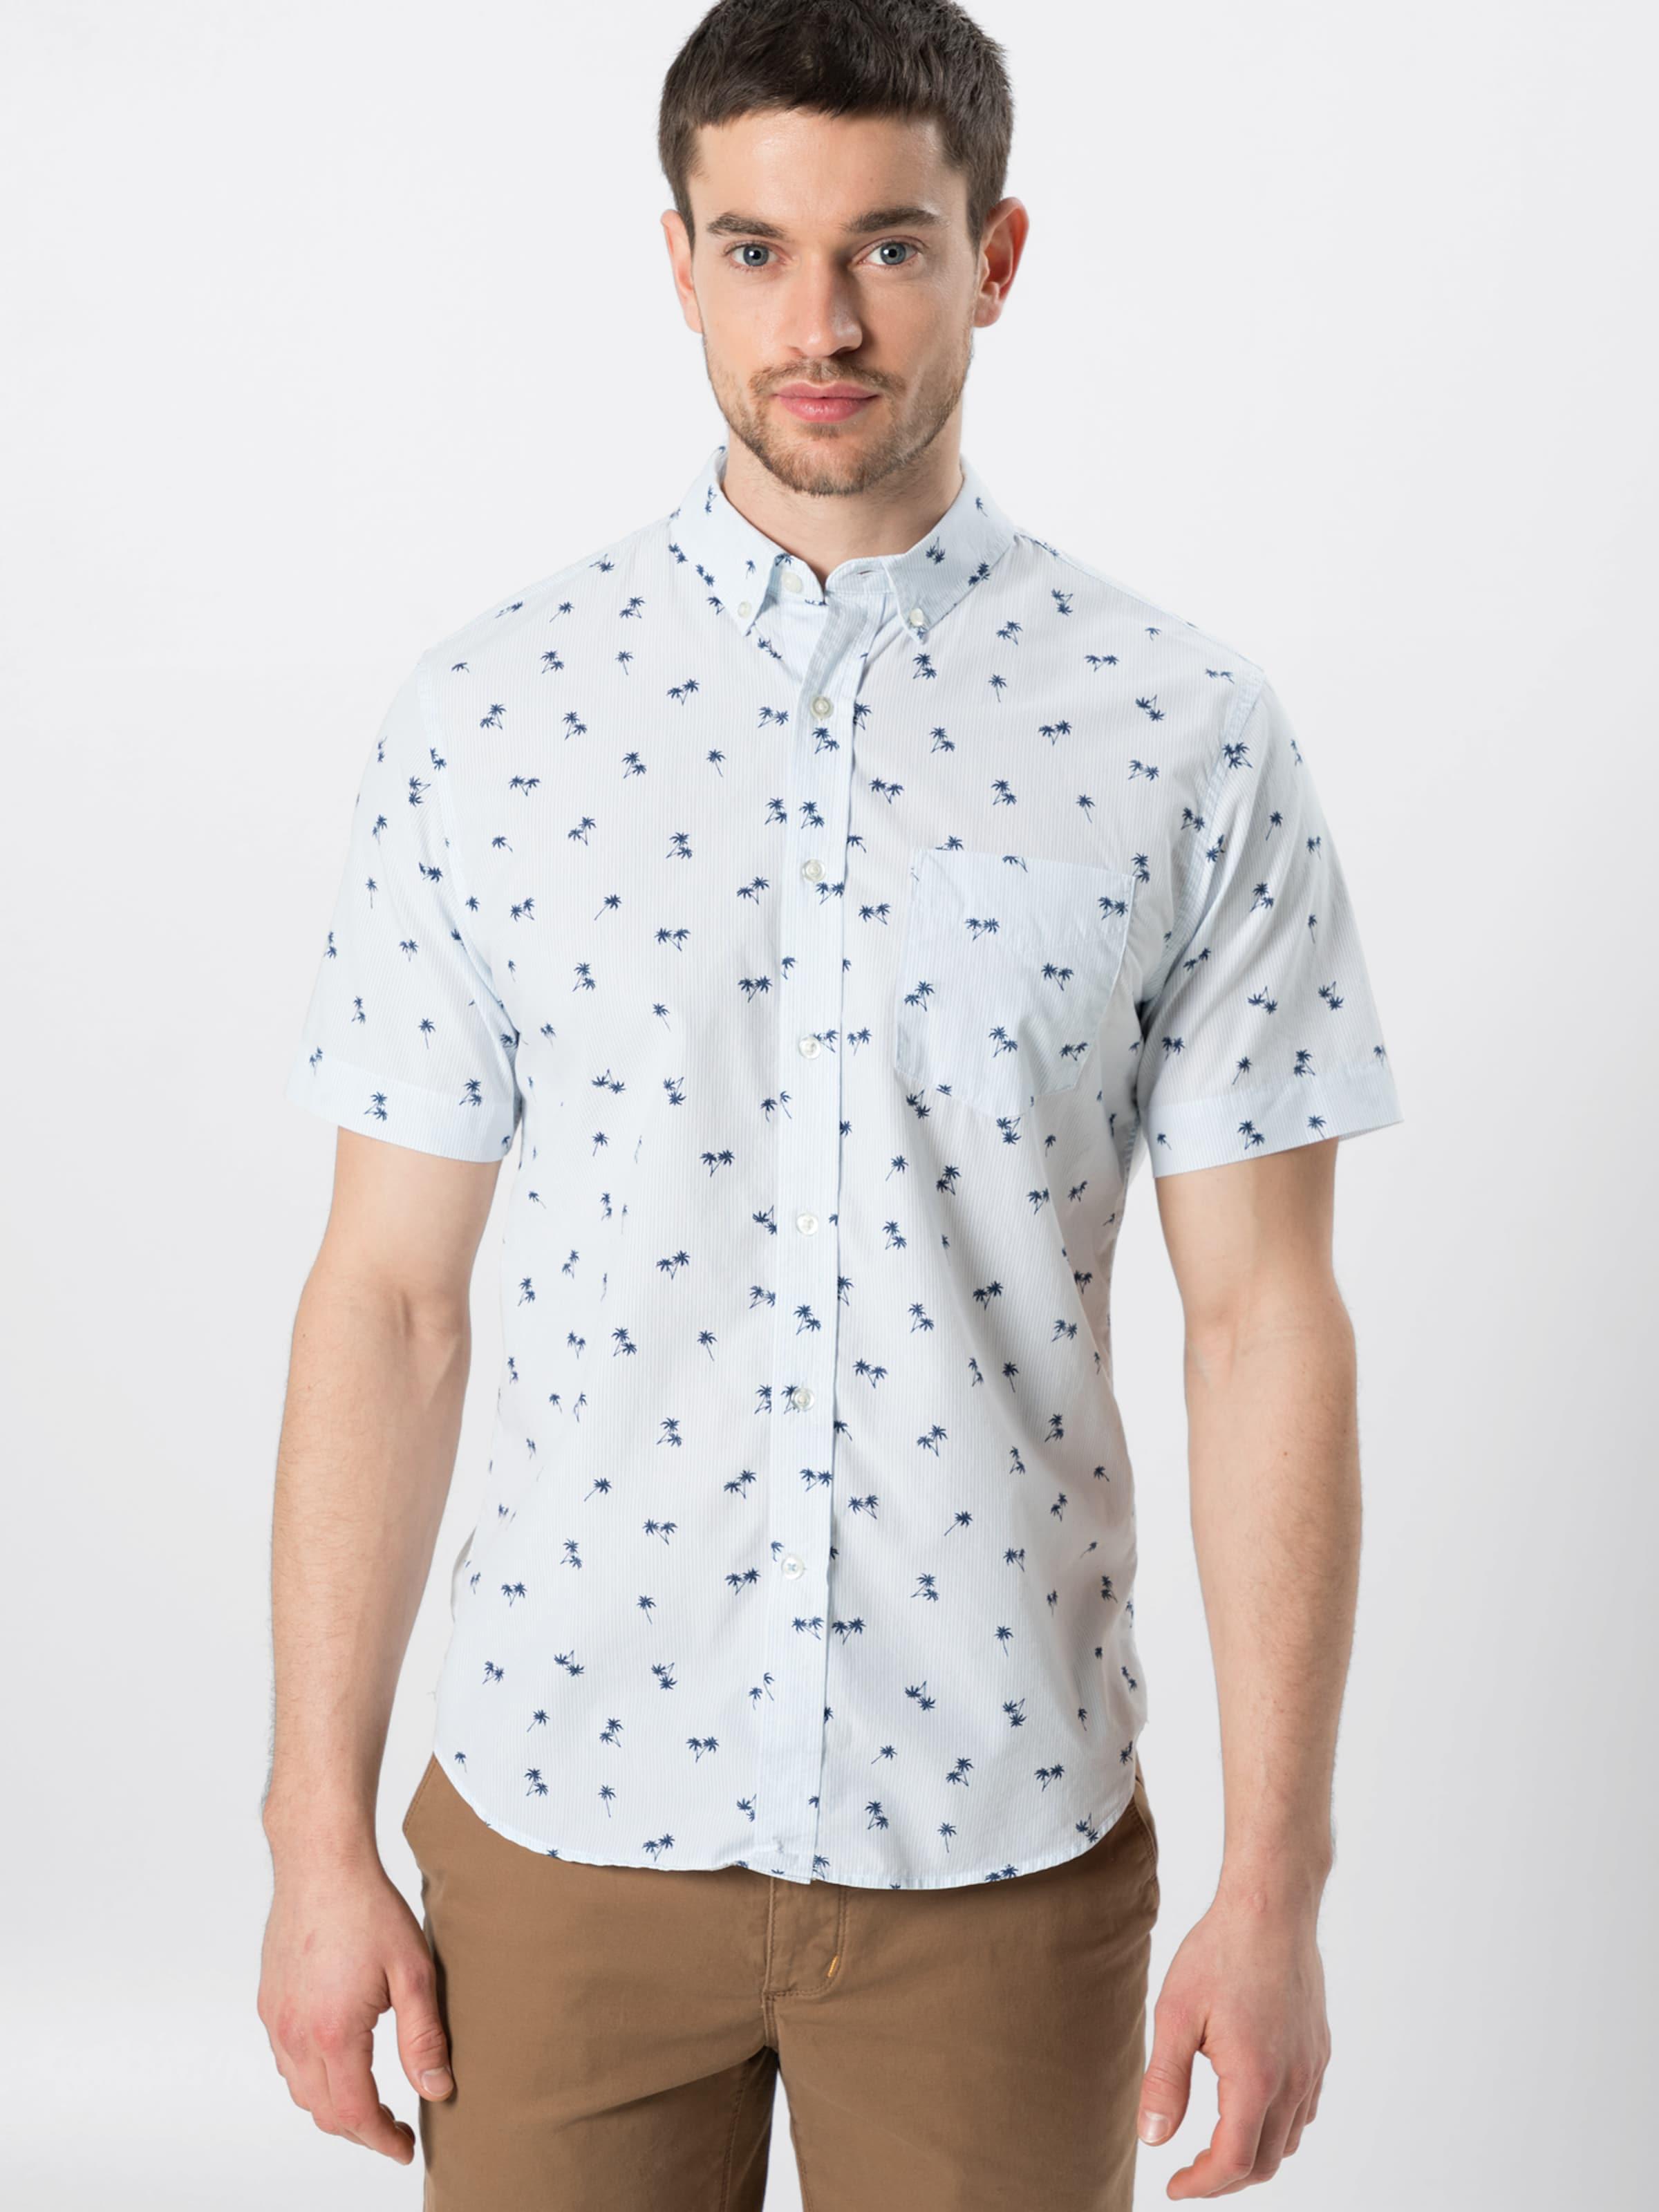 Chemise Lp Banana 'ss Bleu En Republic Shirt' Print QoxdBWrCe